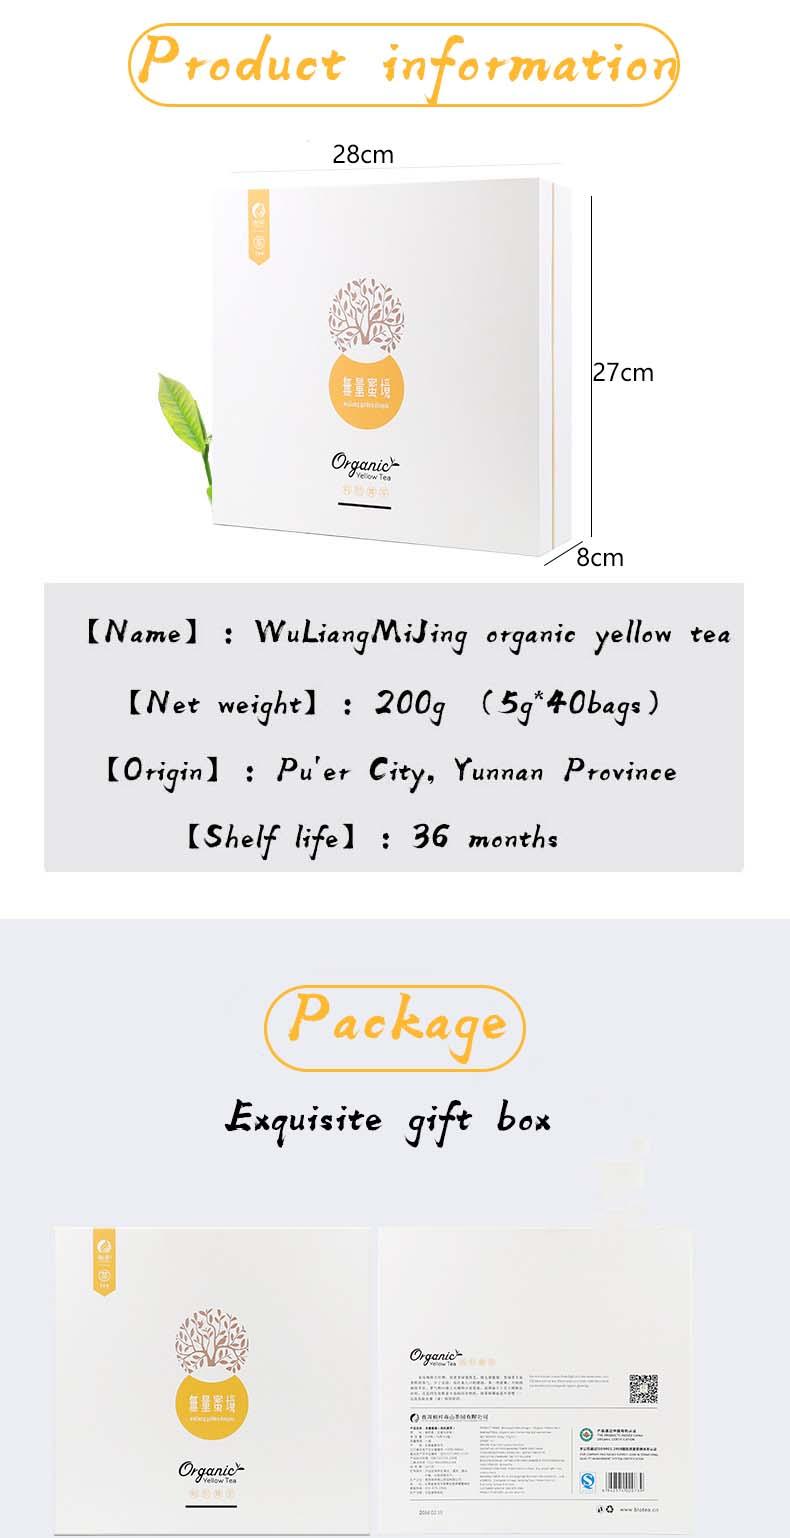 Yunnan Wuliang MiJing Luxury Gift Box Packaging 5g Each Bag Easy Carry Travel Packing Holiday Gift Organic Bagged Yellow Tea - 4uTea | 4uTea.com